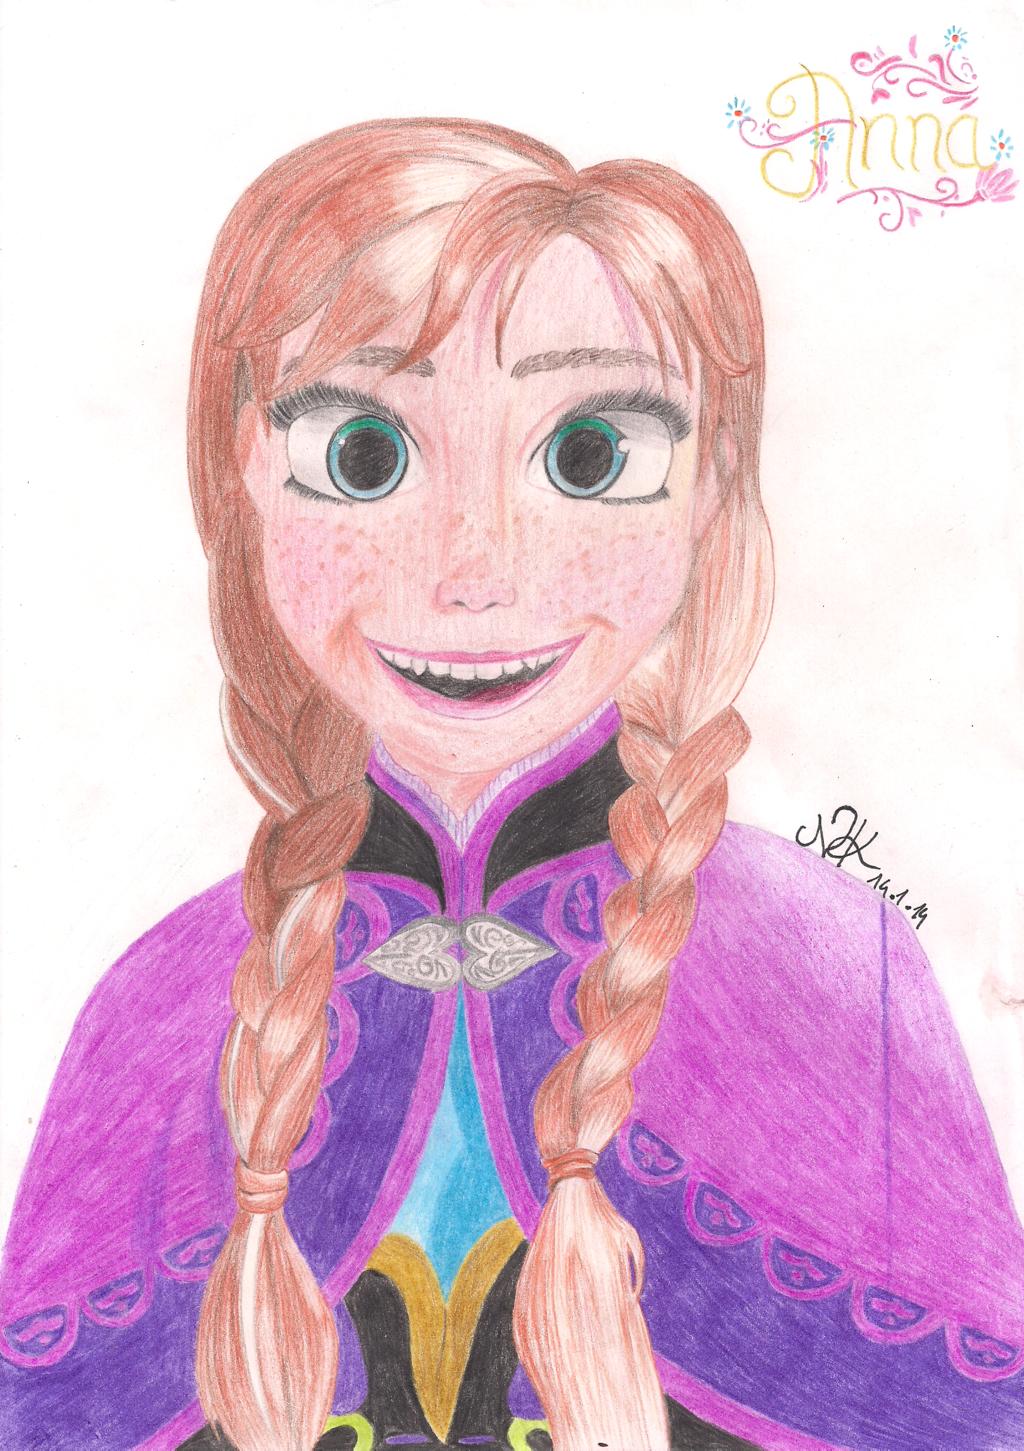 Drawn princess anna frozen Princess xNiciCupcake Frozen from Anna